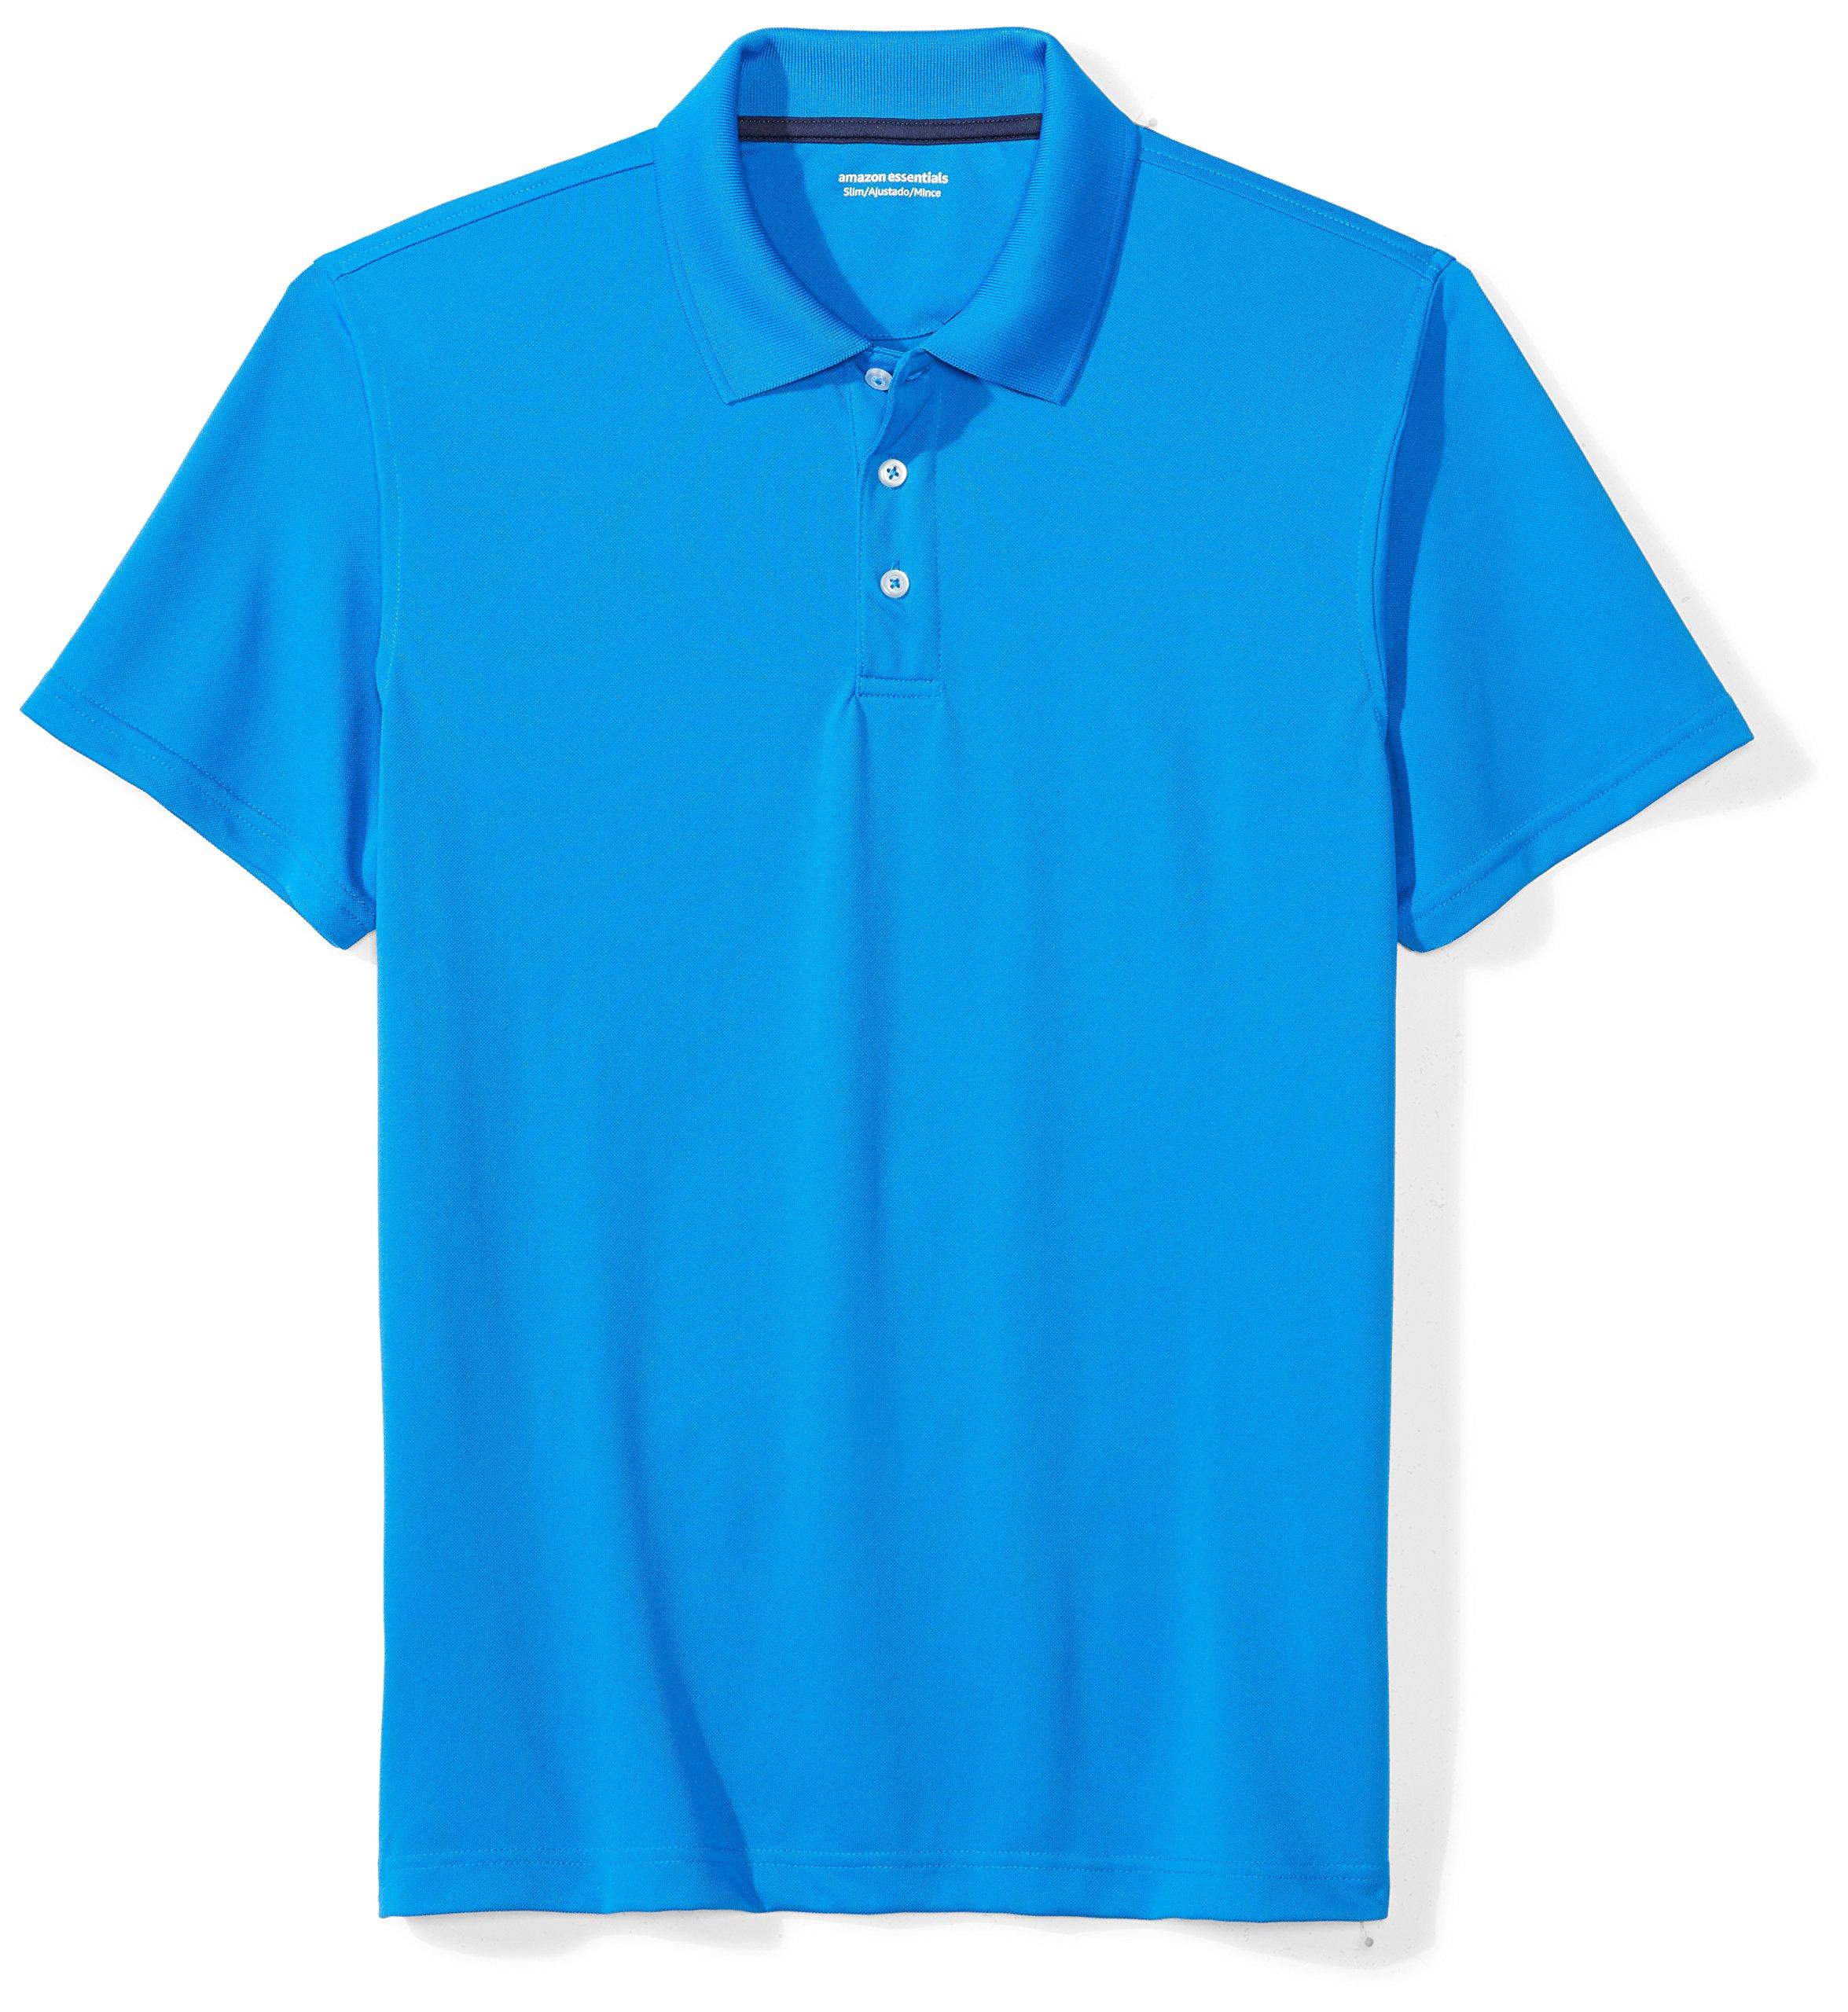 Amazon Essentials Men's Standard Slim-Fit Quick-Dry Golf Polo Shirt, Electric Blue, Large